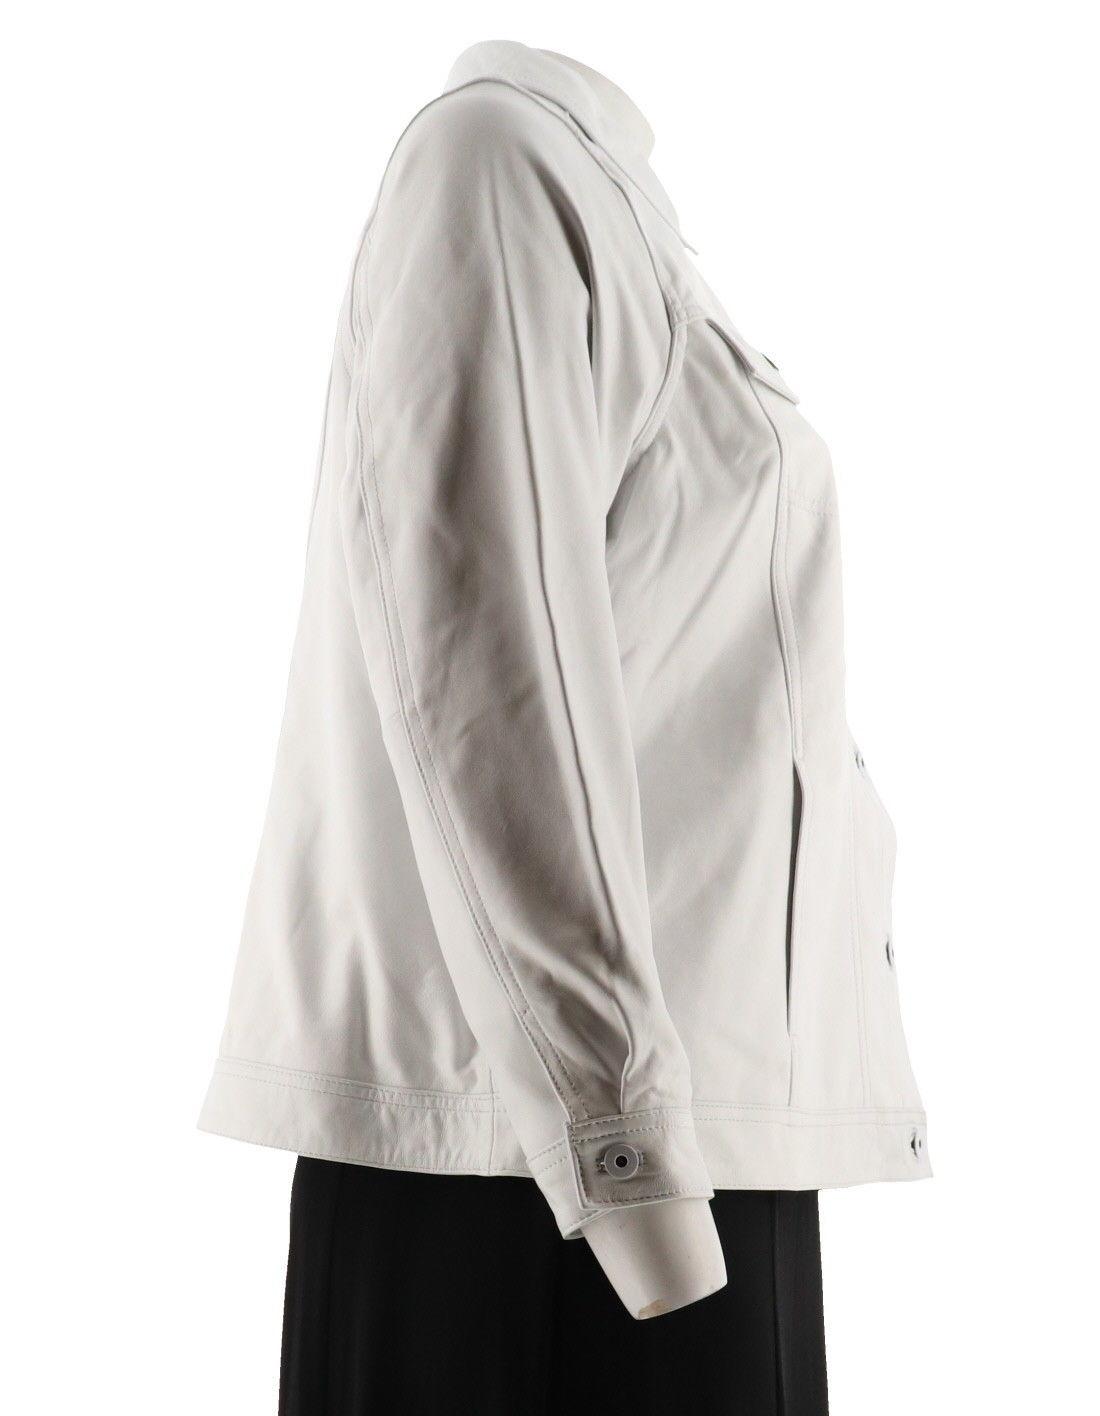 Denim & Co Lamb Leather Jean Jacket Soft White XXS NEW A272640